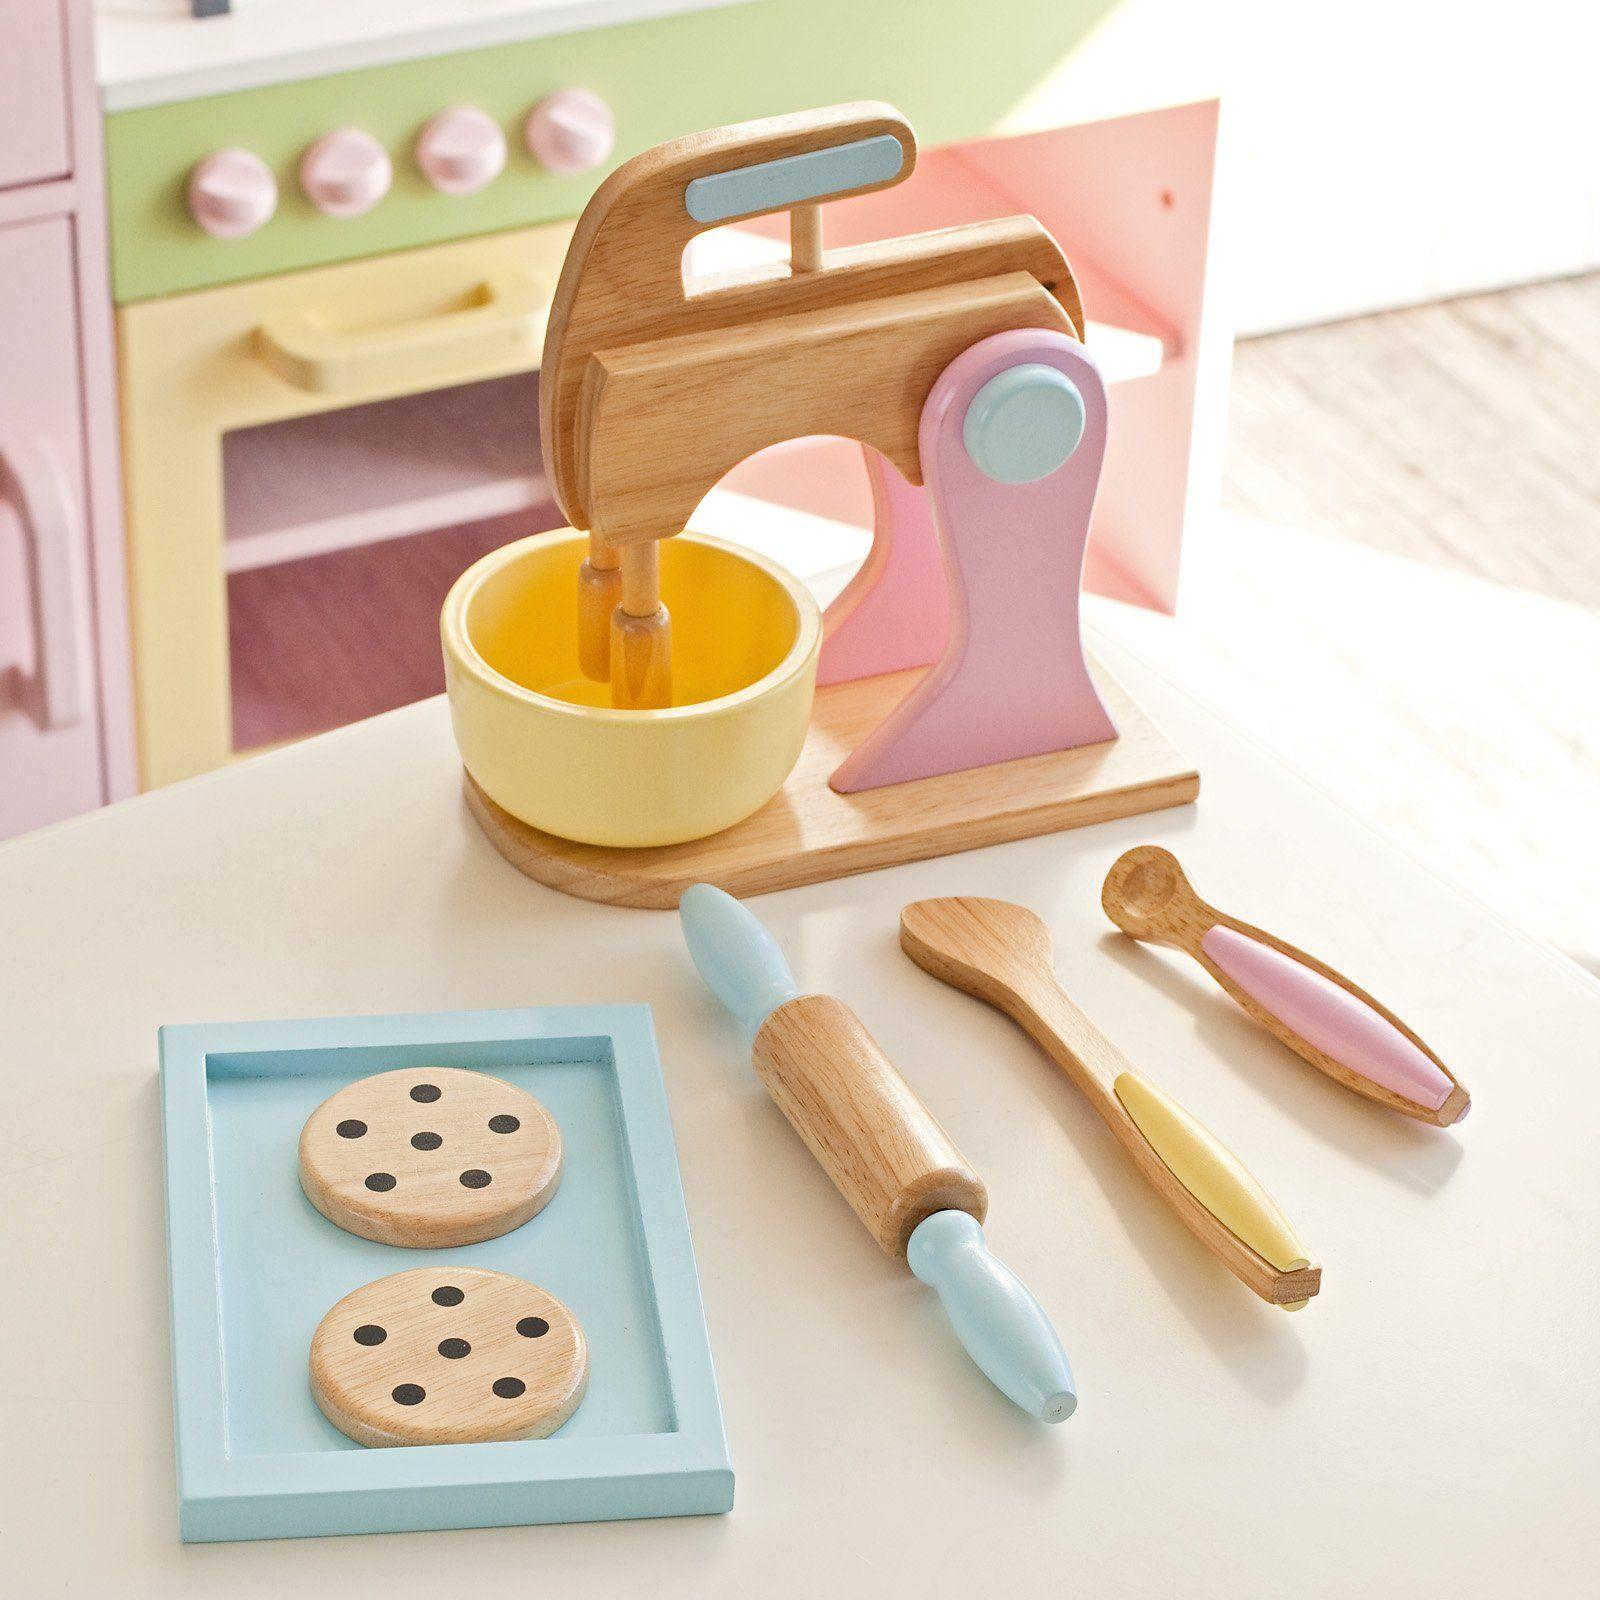 Kidkraft 4 Pack Bundle Of Accessories Play Kitchen